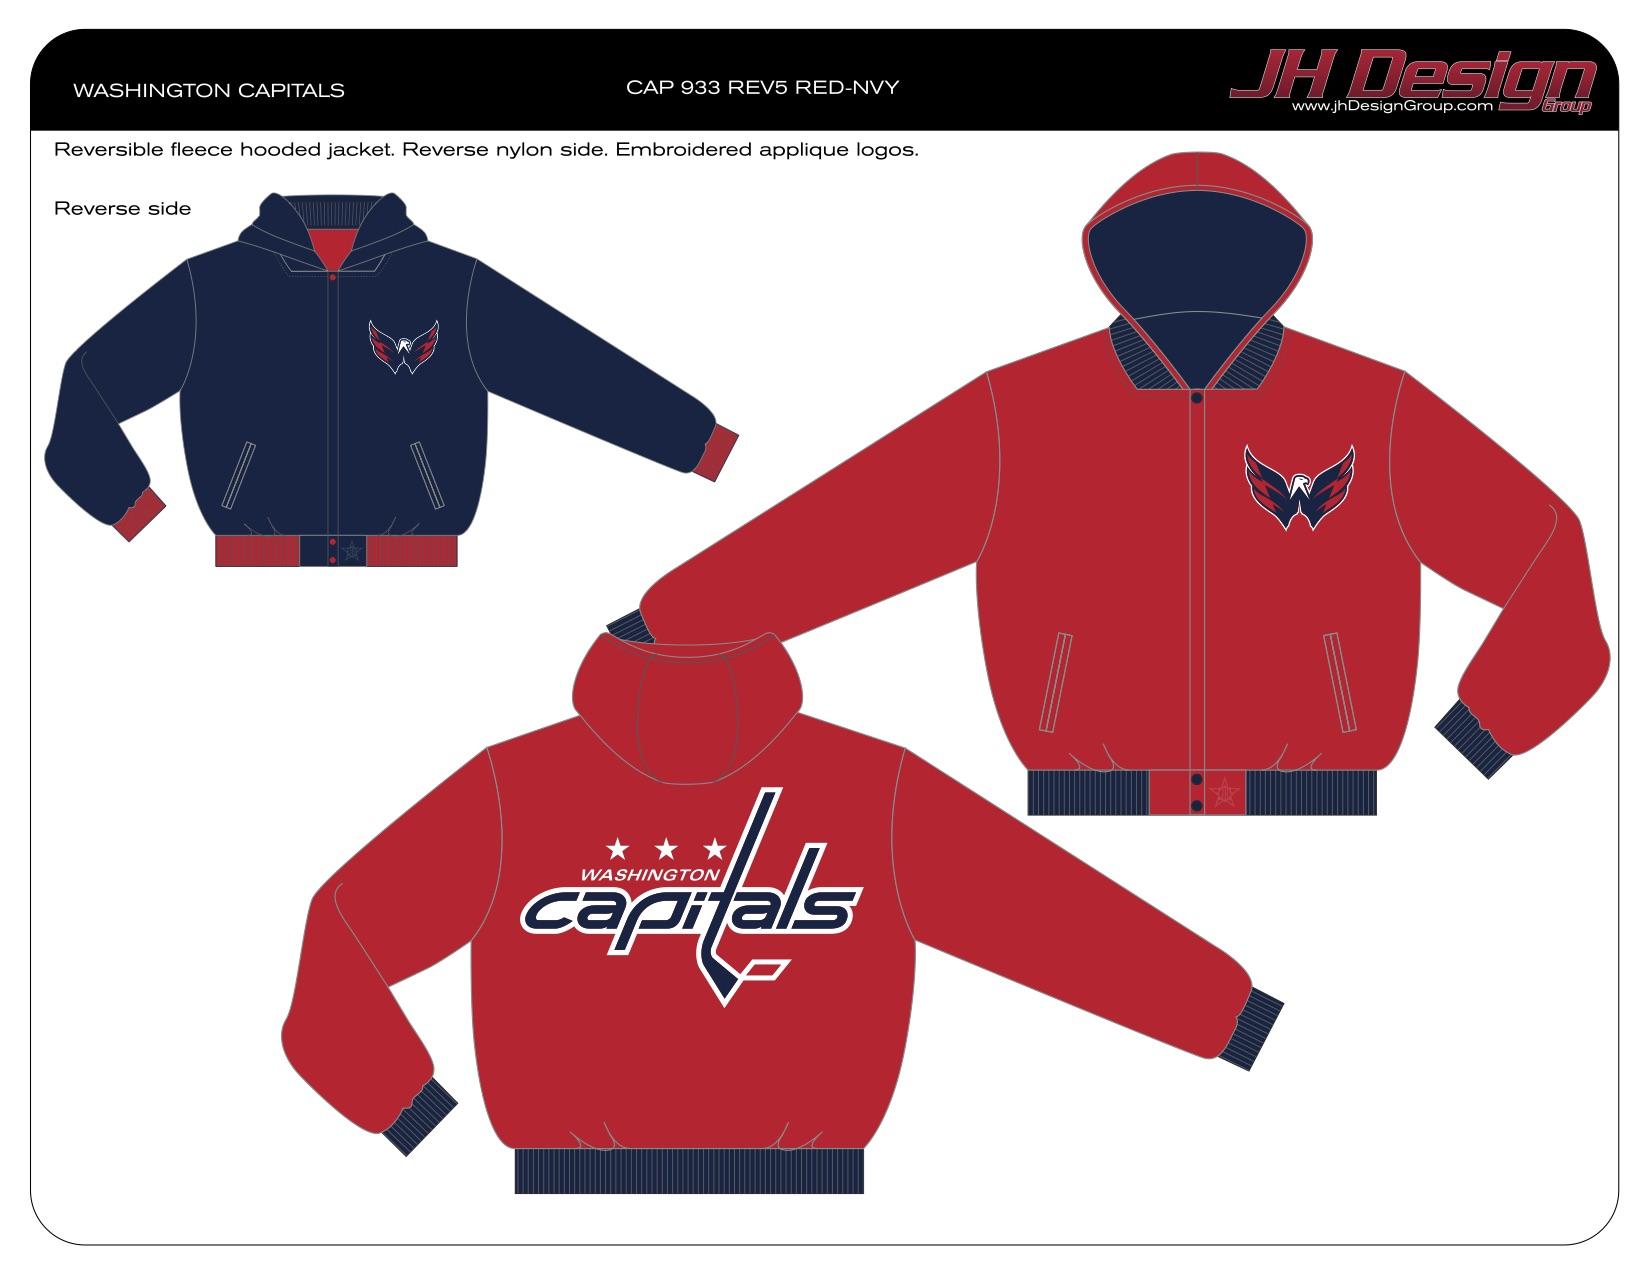 CAP 933 REV5 RED-NVY